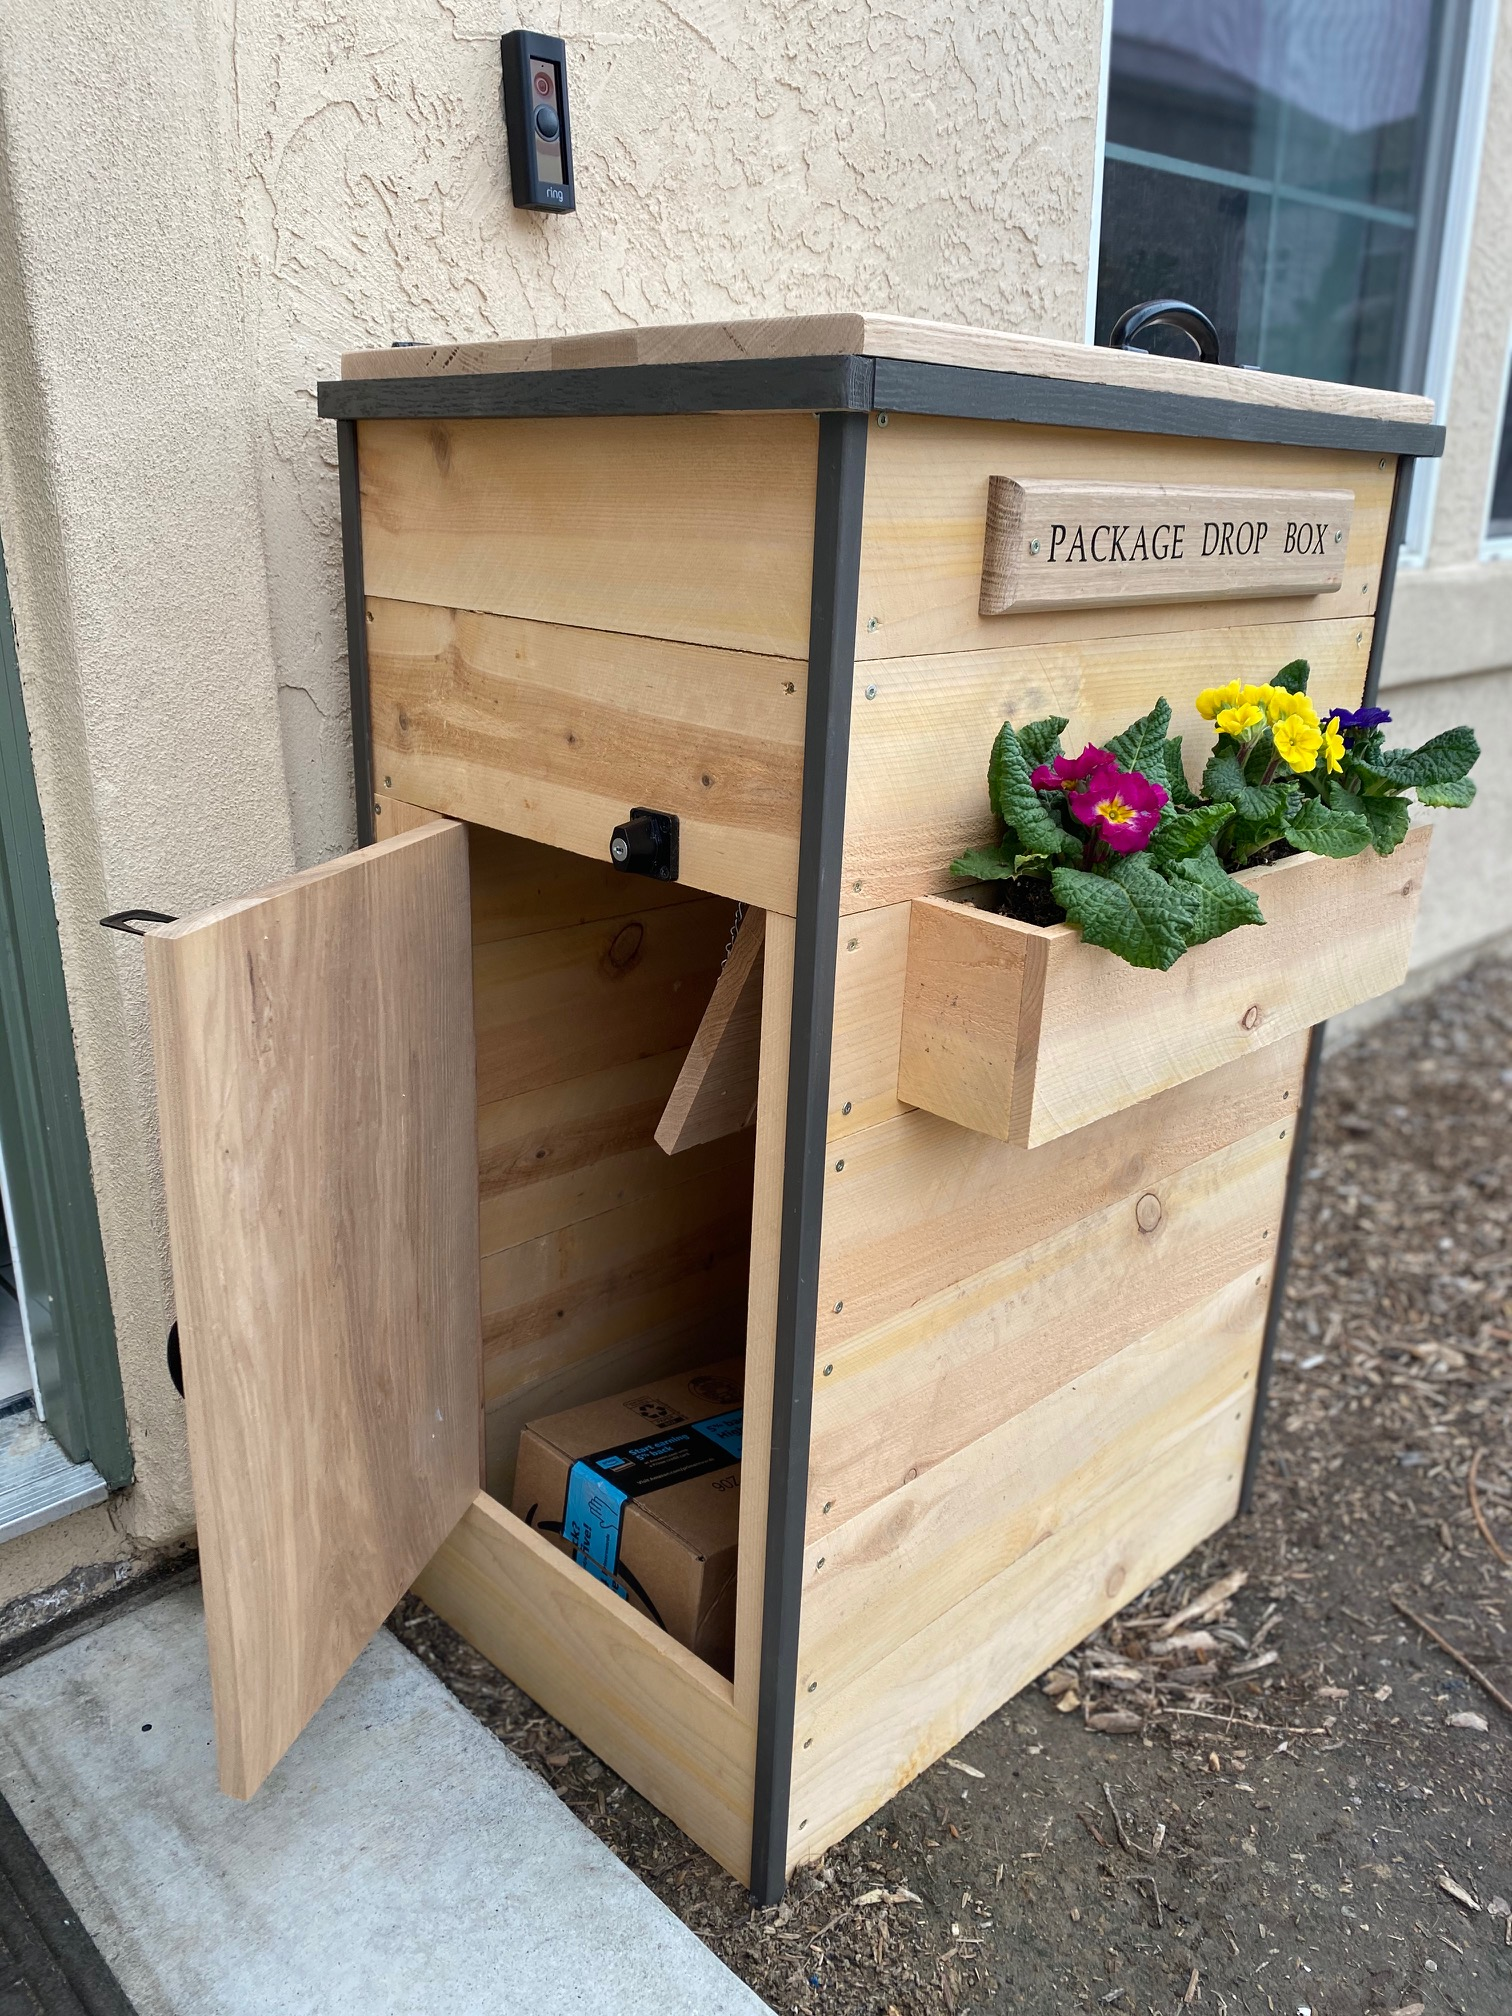 Package Drop Box In 2020 Drop Box Ideas Diy Mailbox Parcel Drop Box